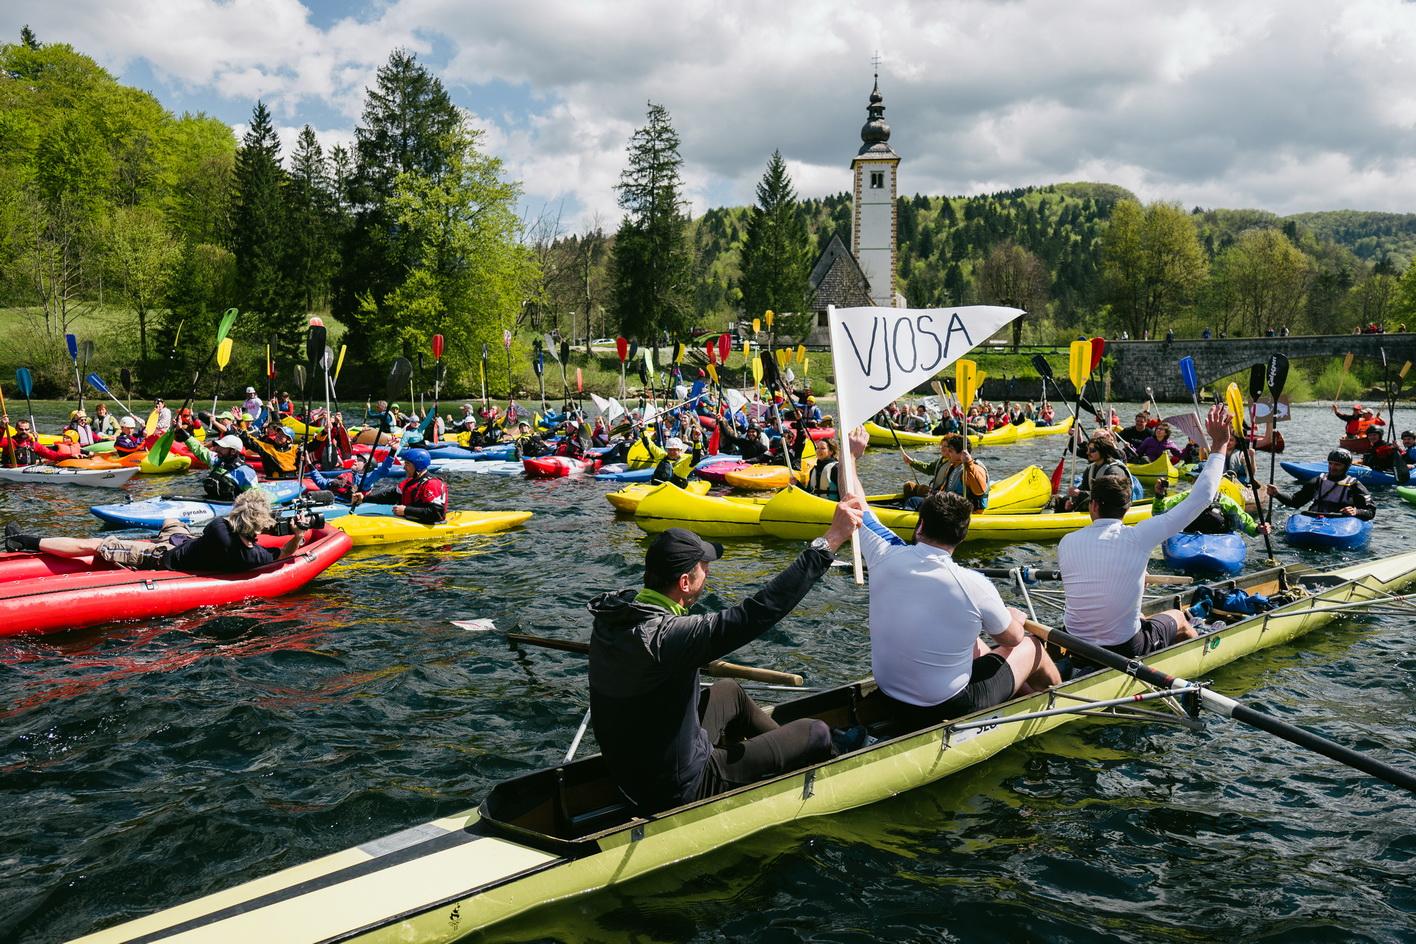 About 150 paddlers opened the Balkan Rivers Tour at Bohinj Lake in Slovenia on Saturday, April 16. © Jan Pirnat